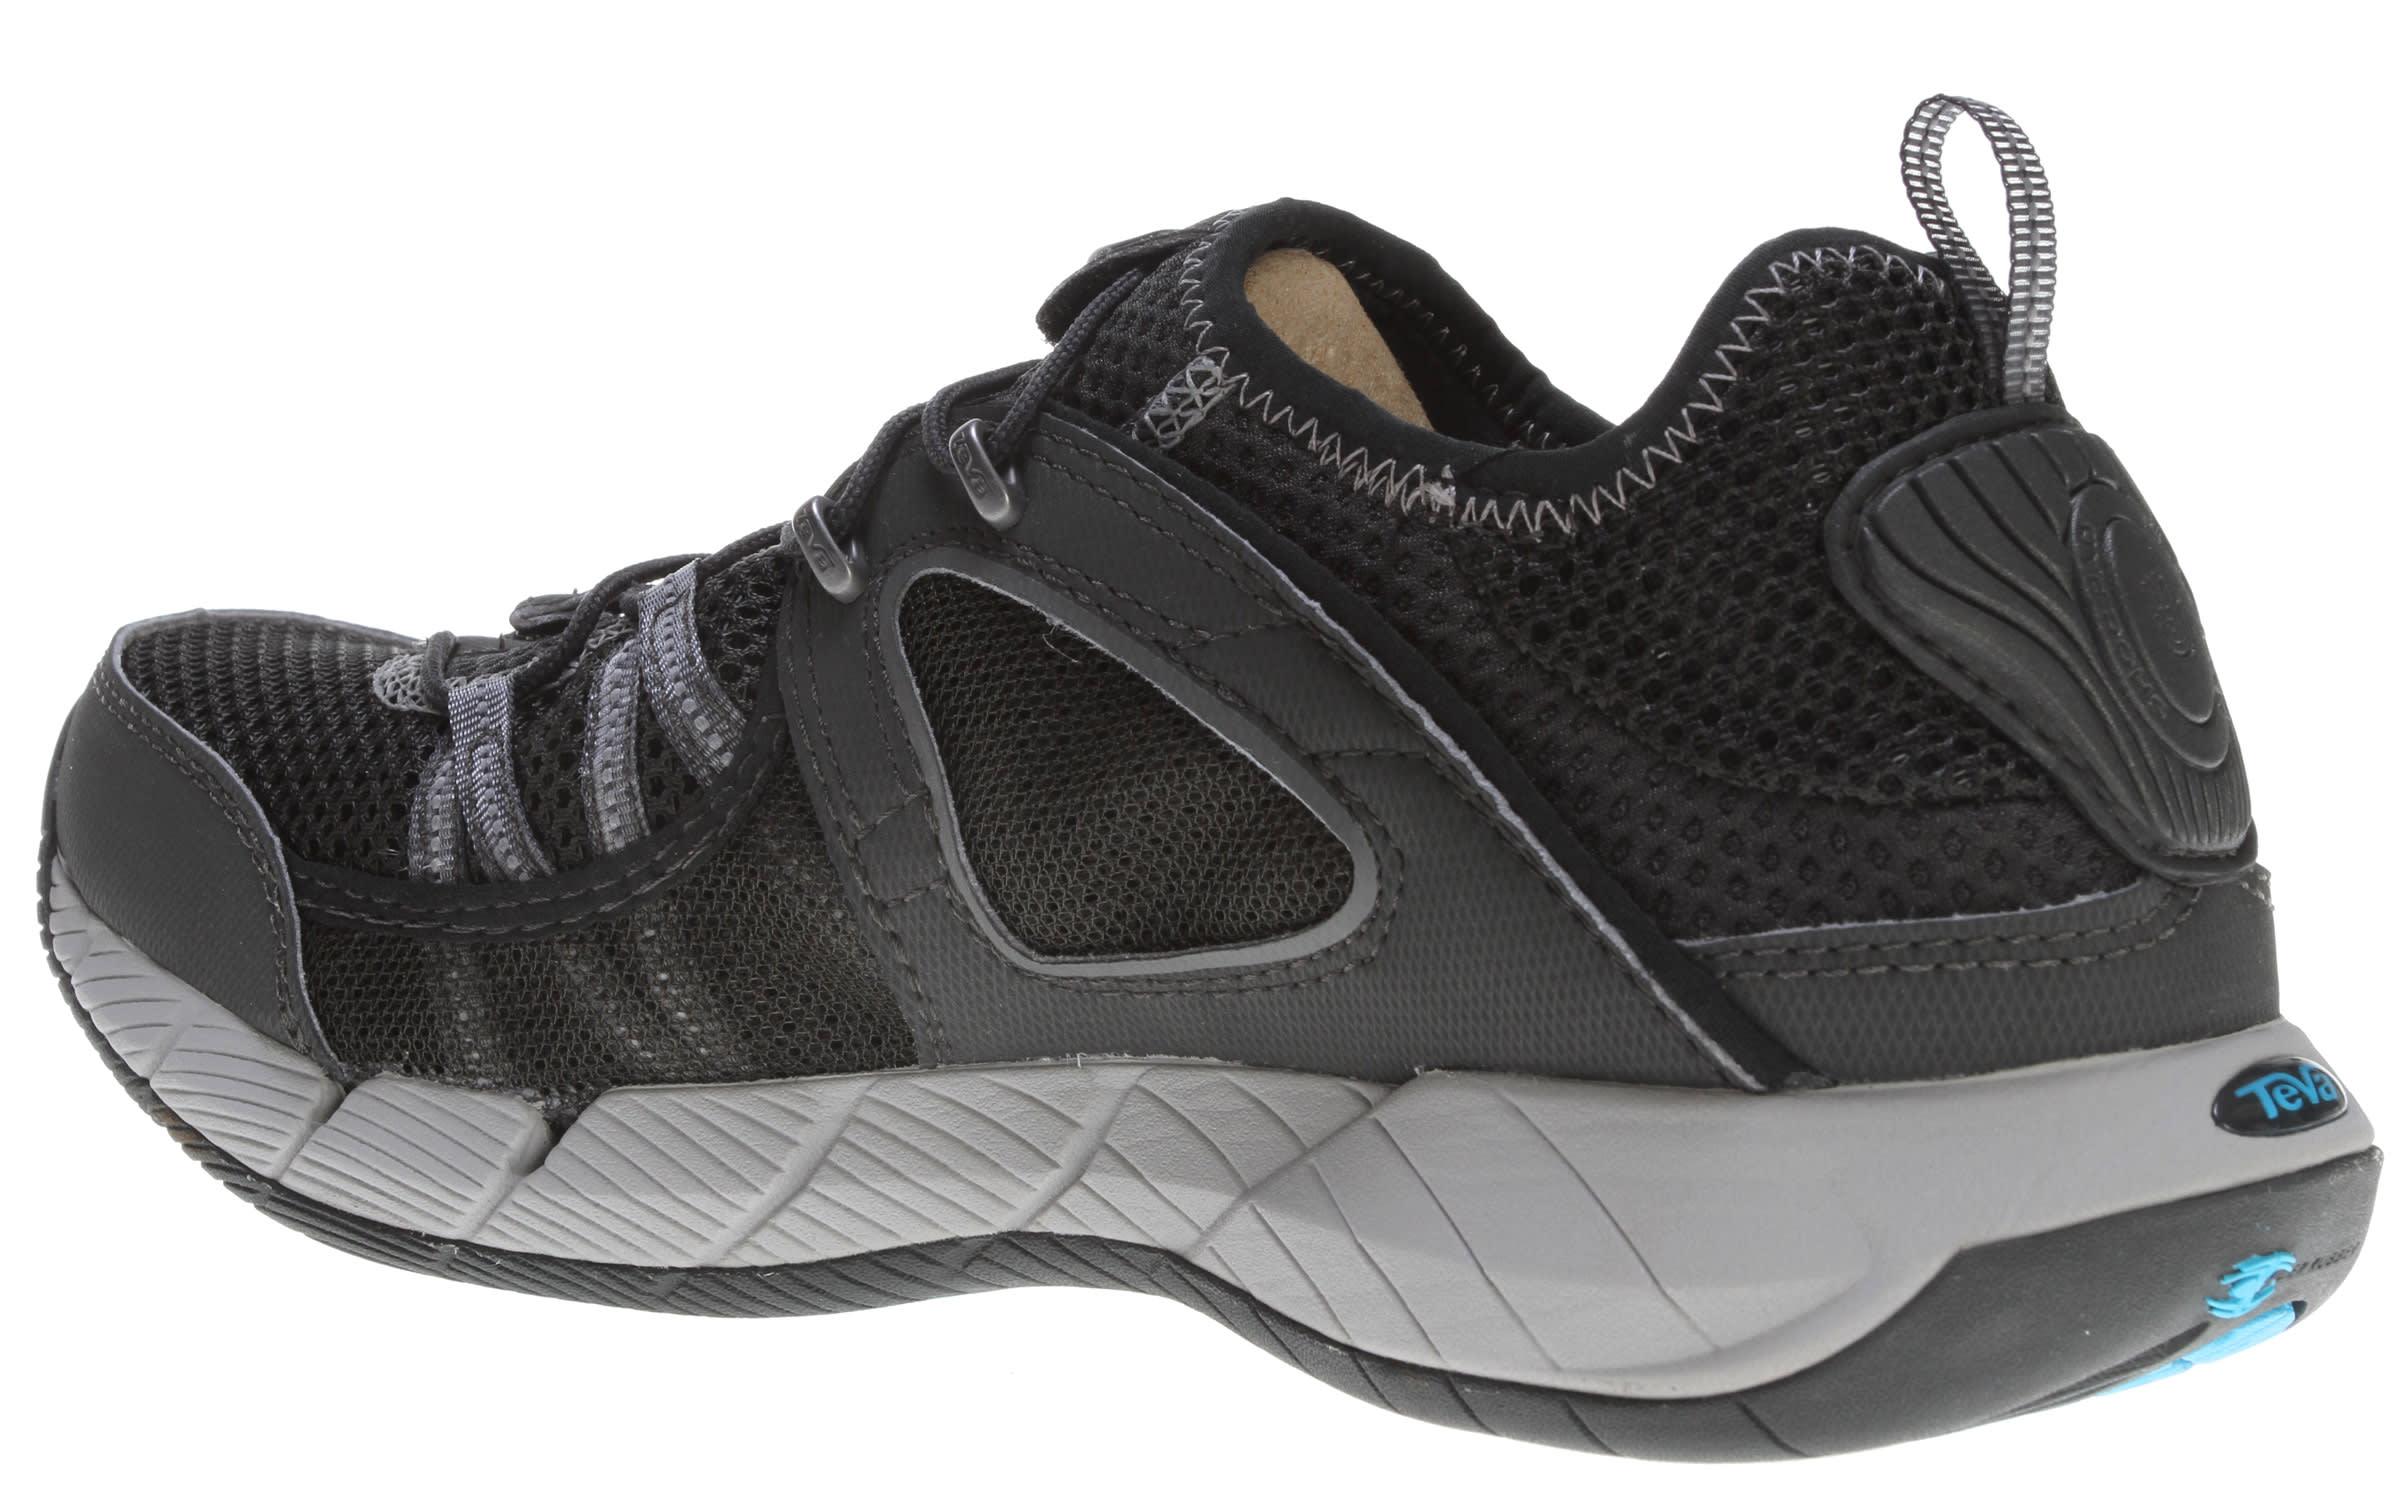 c368e7a20334 Teva Churn Water Shoes - thumbnail 3